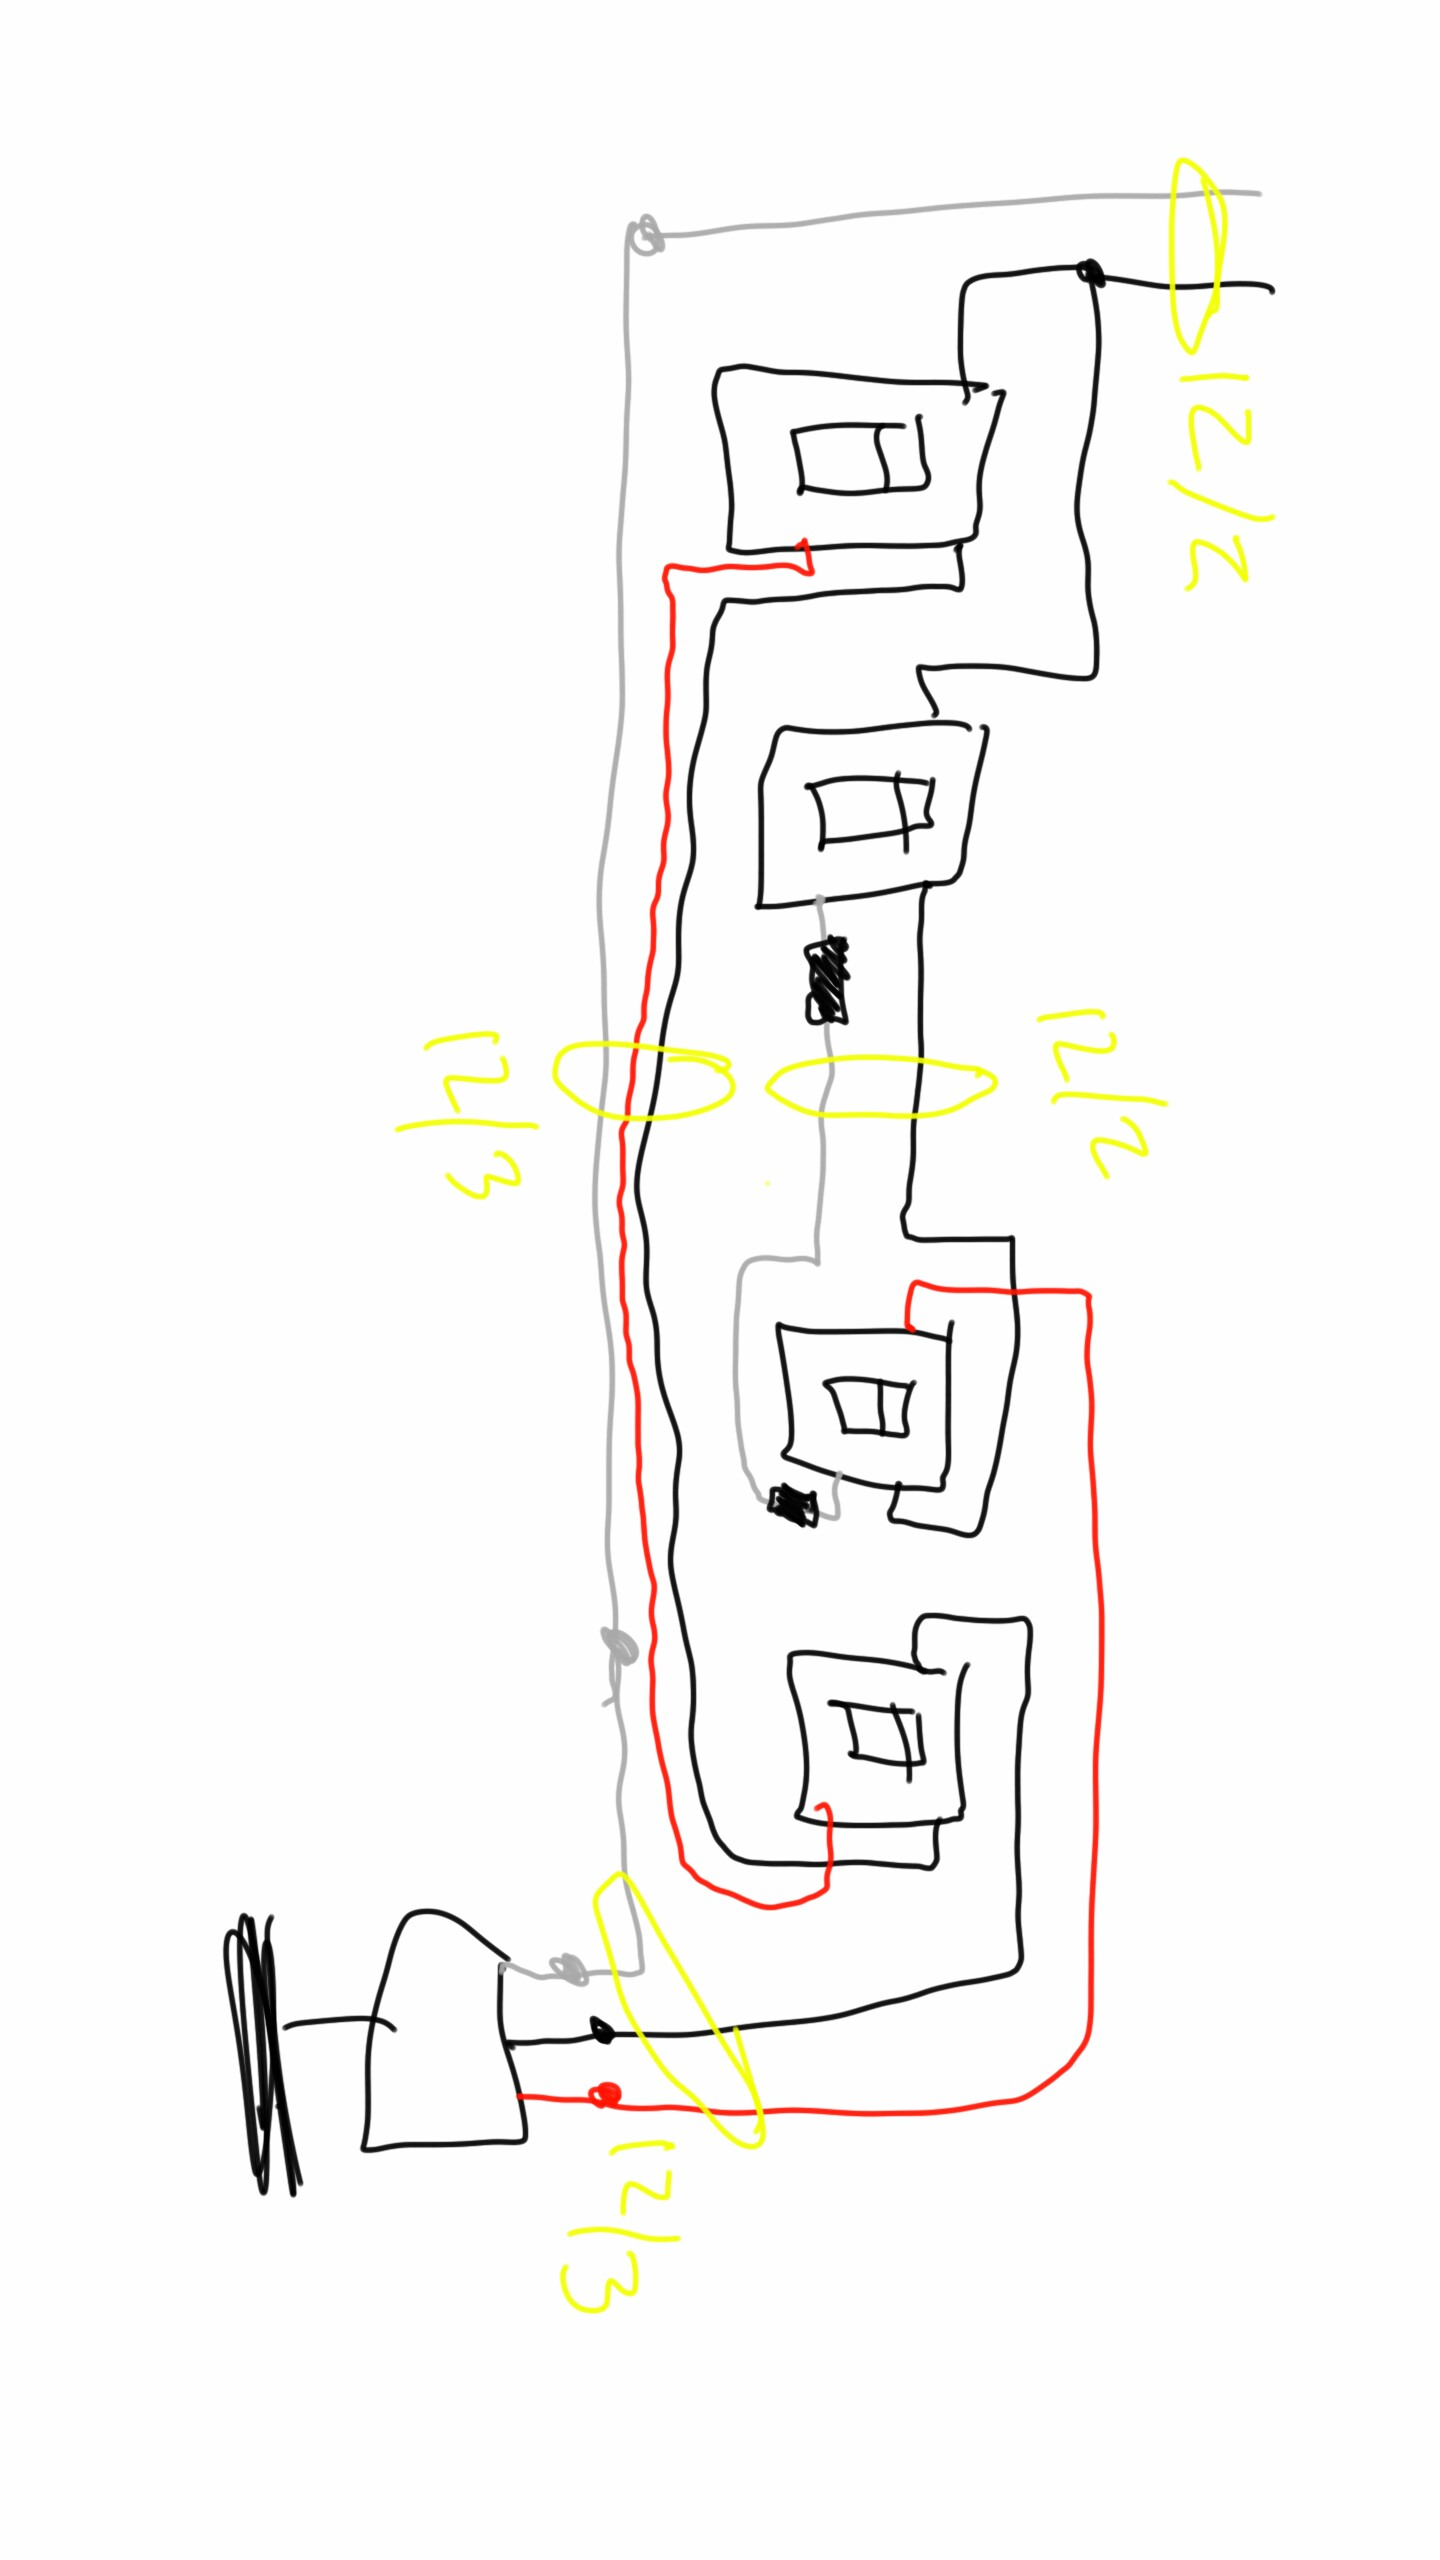 Swell 2 Ways Switch Wiring Diagram Basic Electronics Wiring Diagram Wiring Cloud Itislusmarecoveryedborg